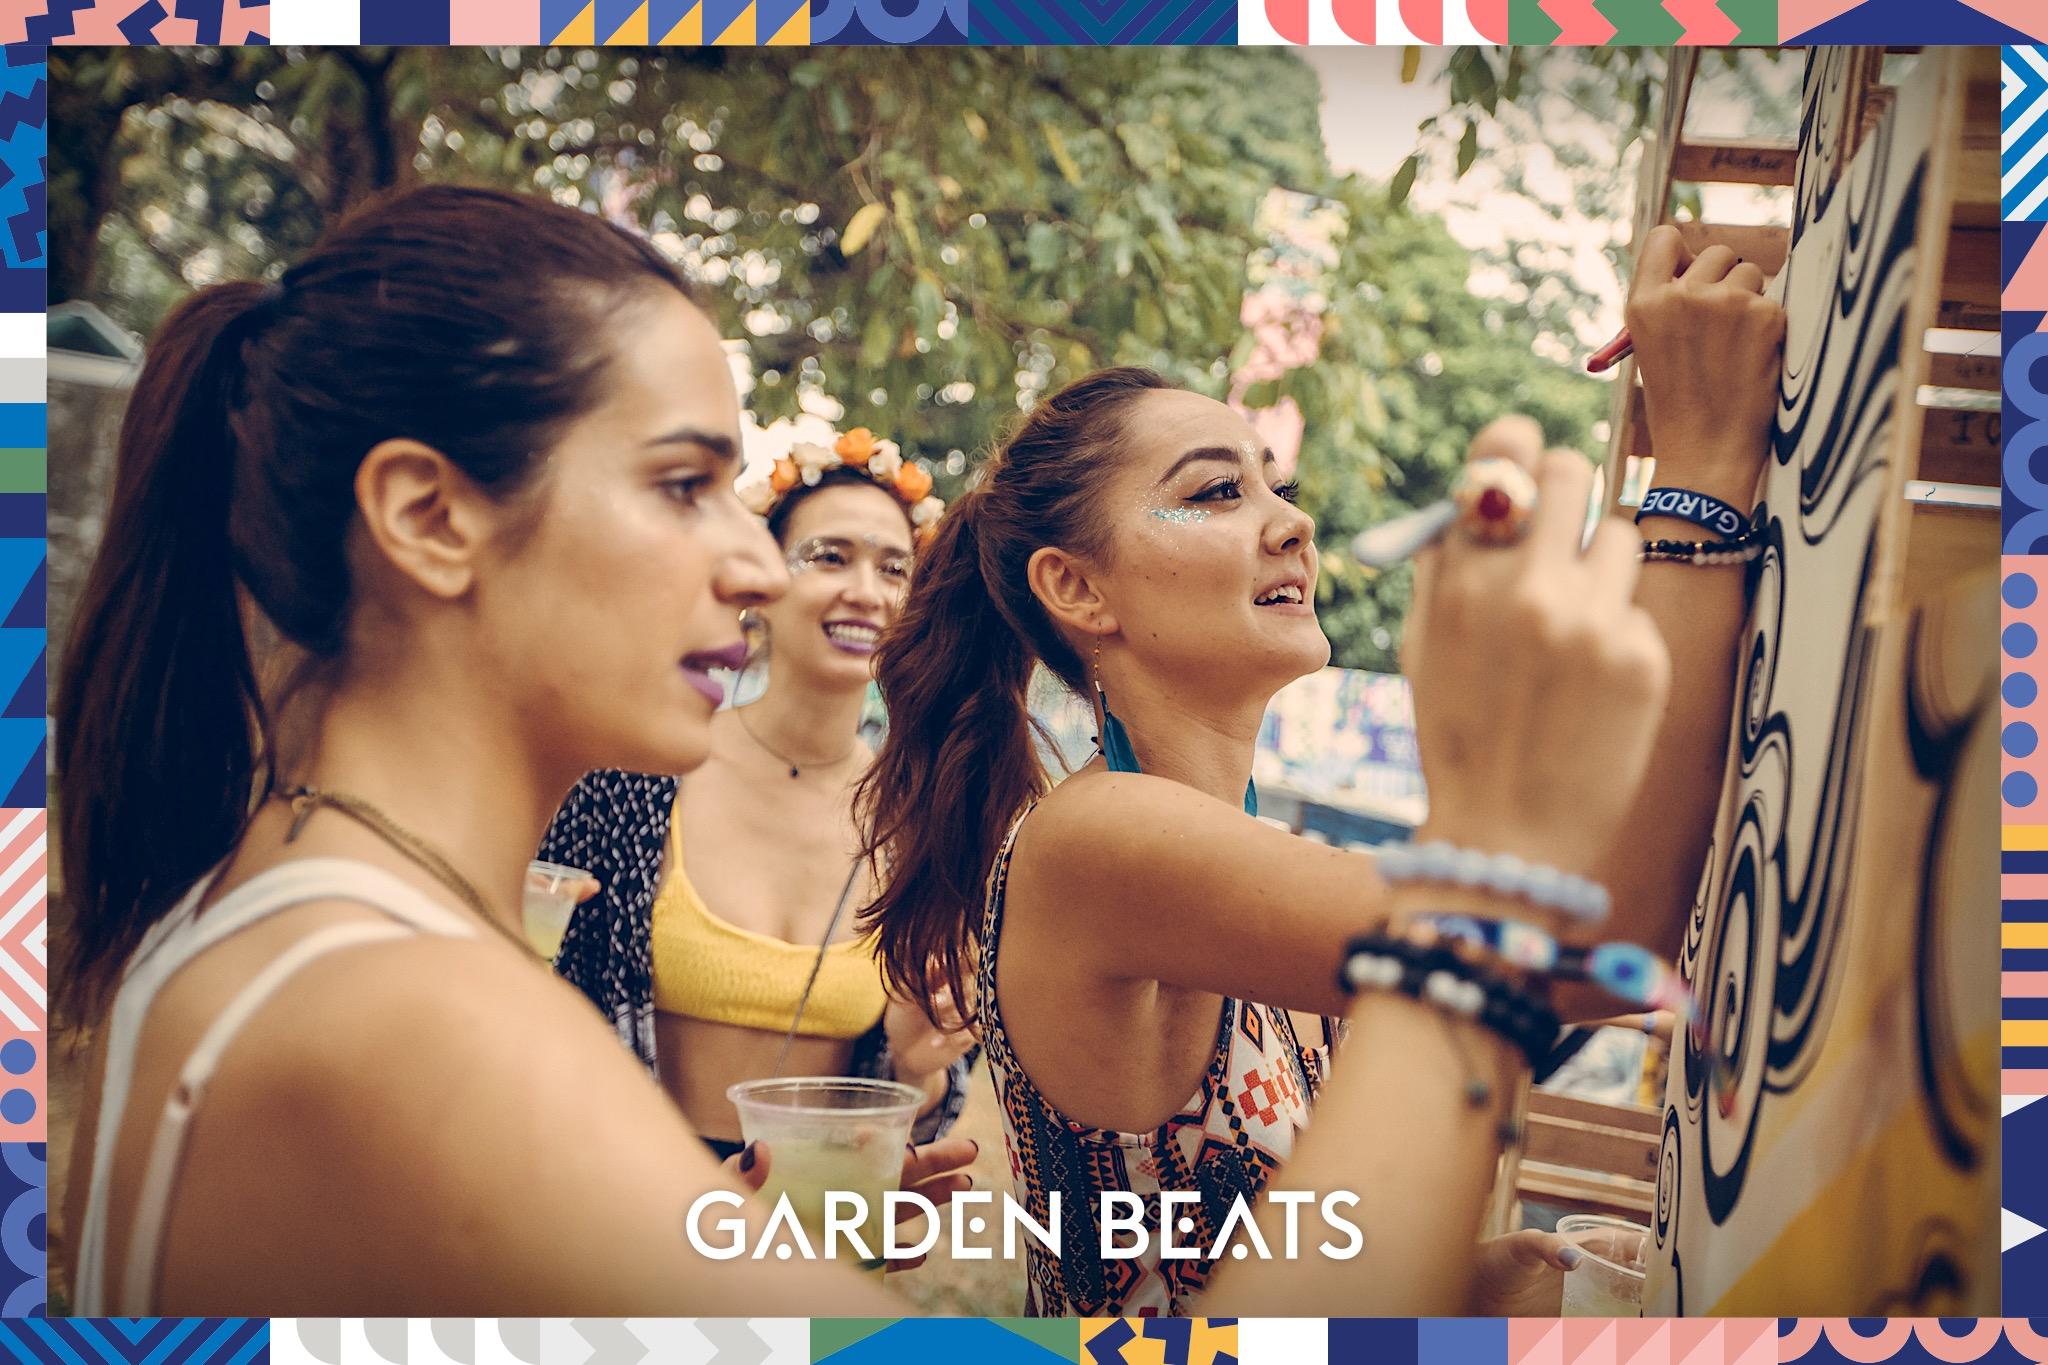 03032018_GardenBeats_Colossal397_Watermarked.jpg